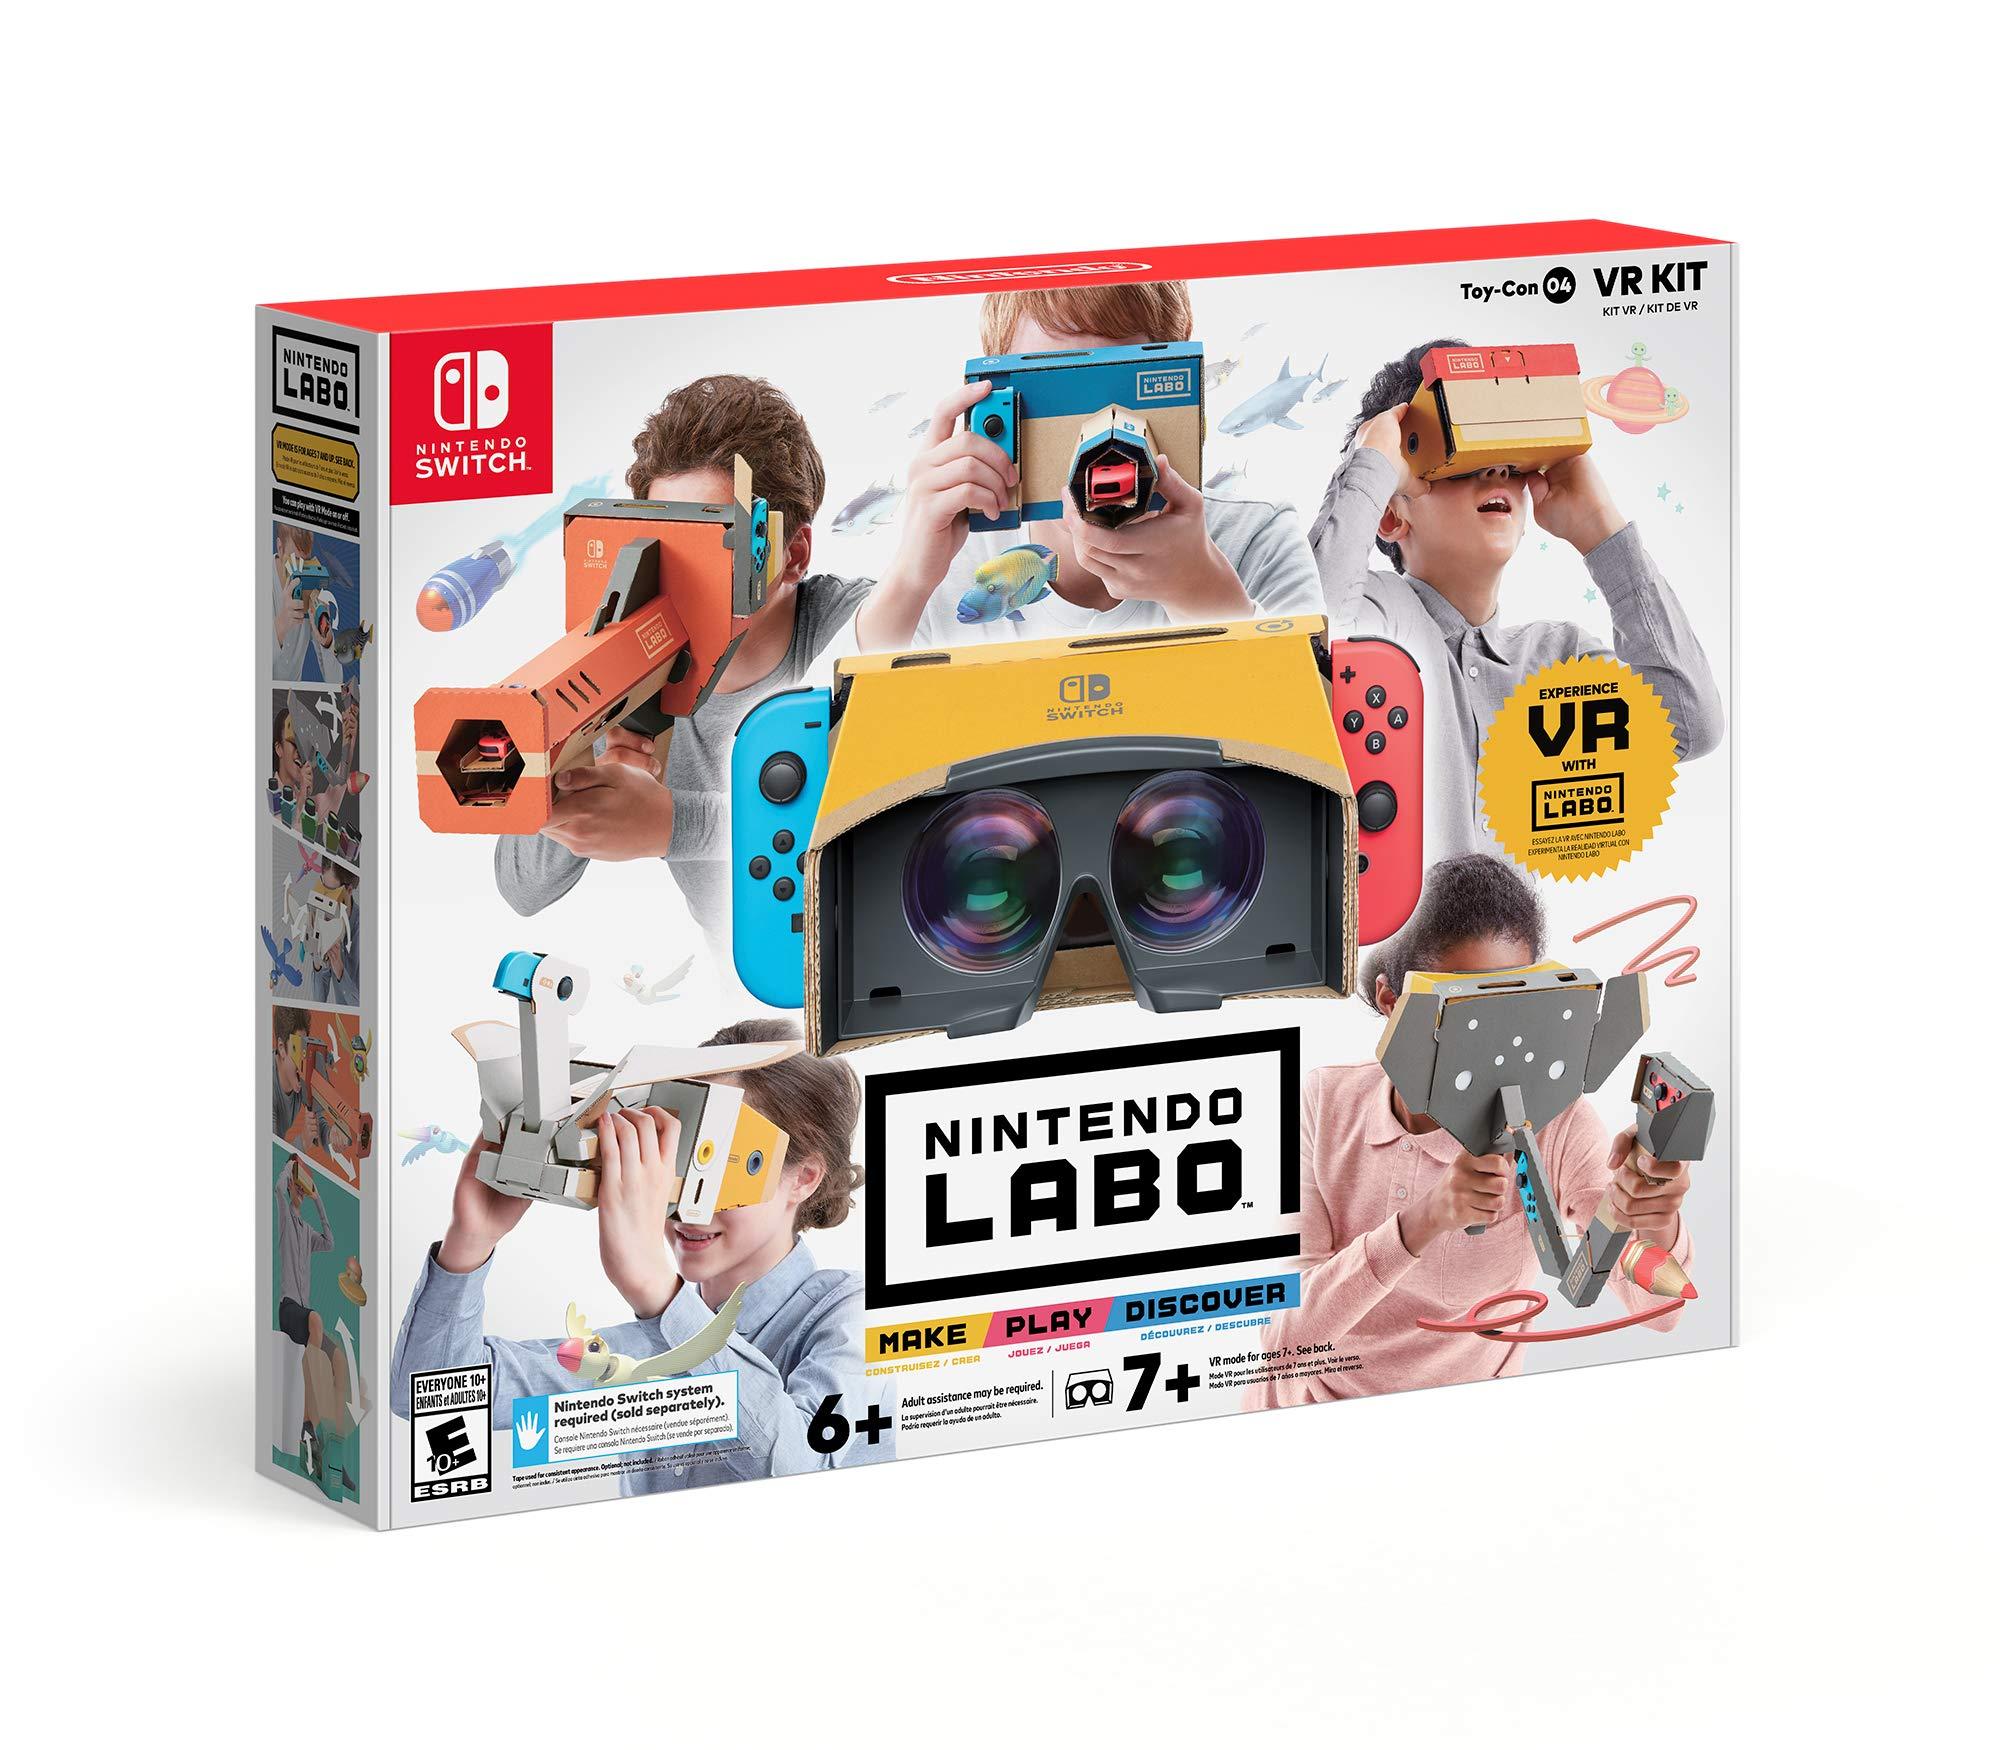 Nintendo Labo Toy